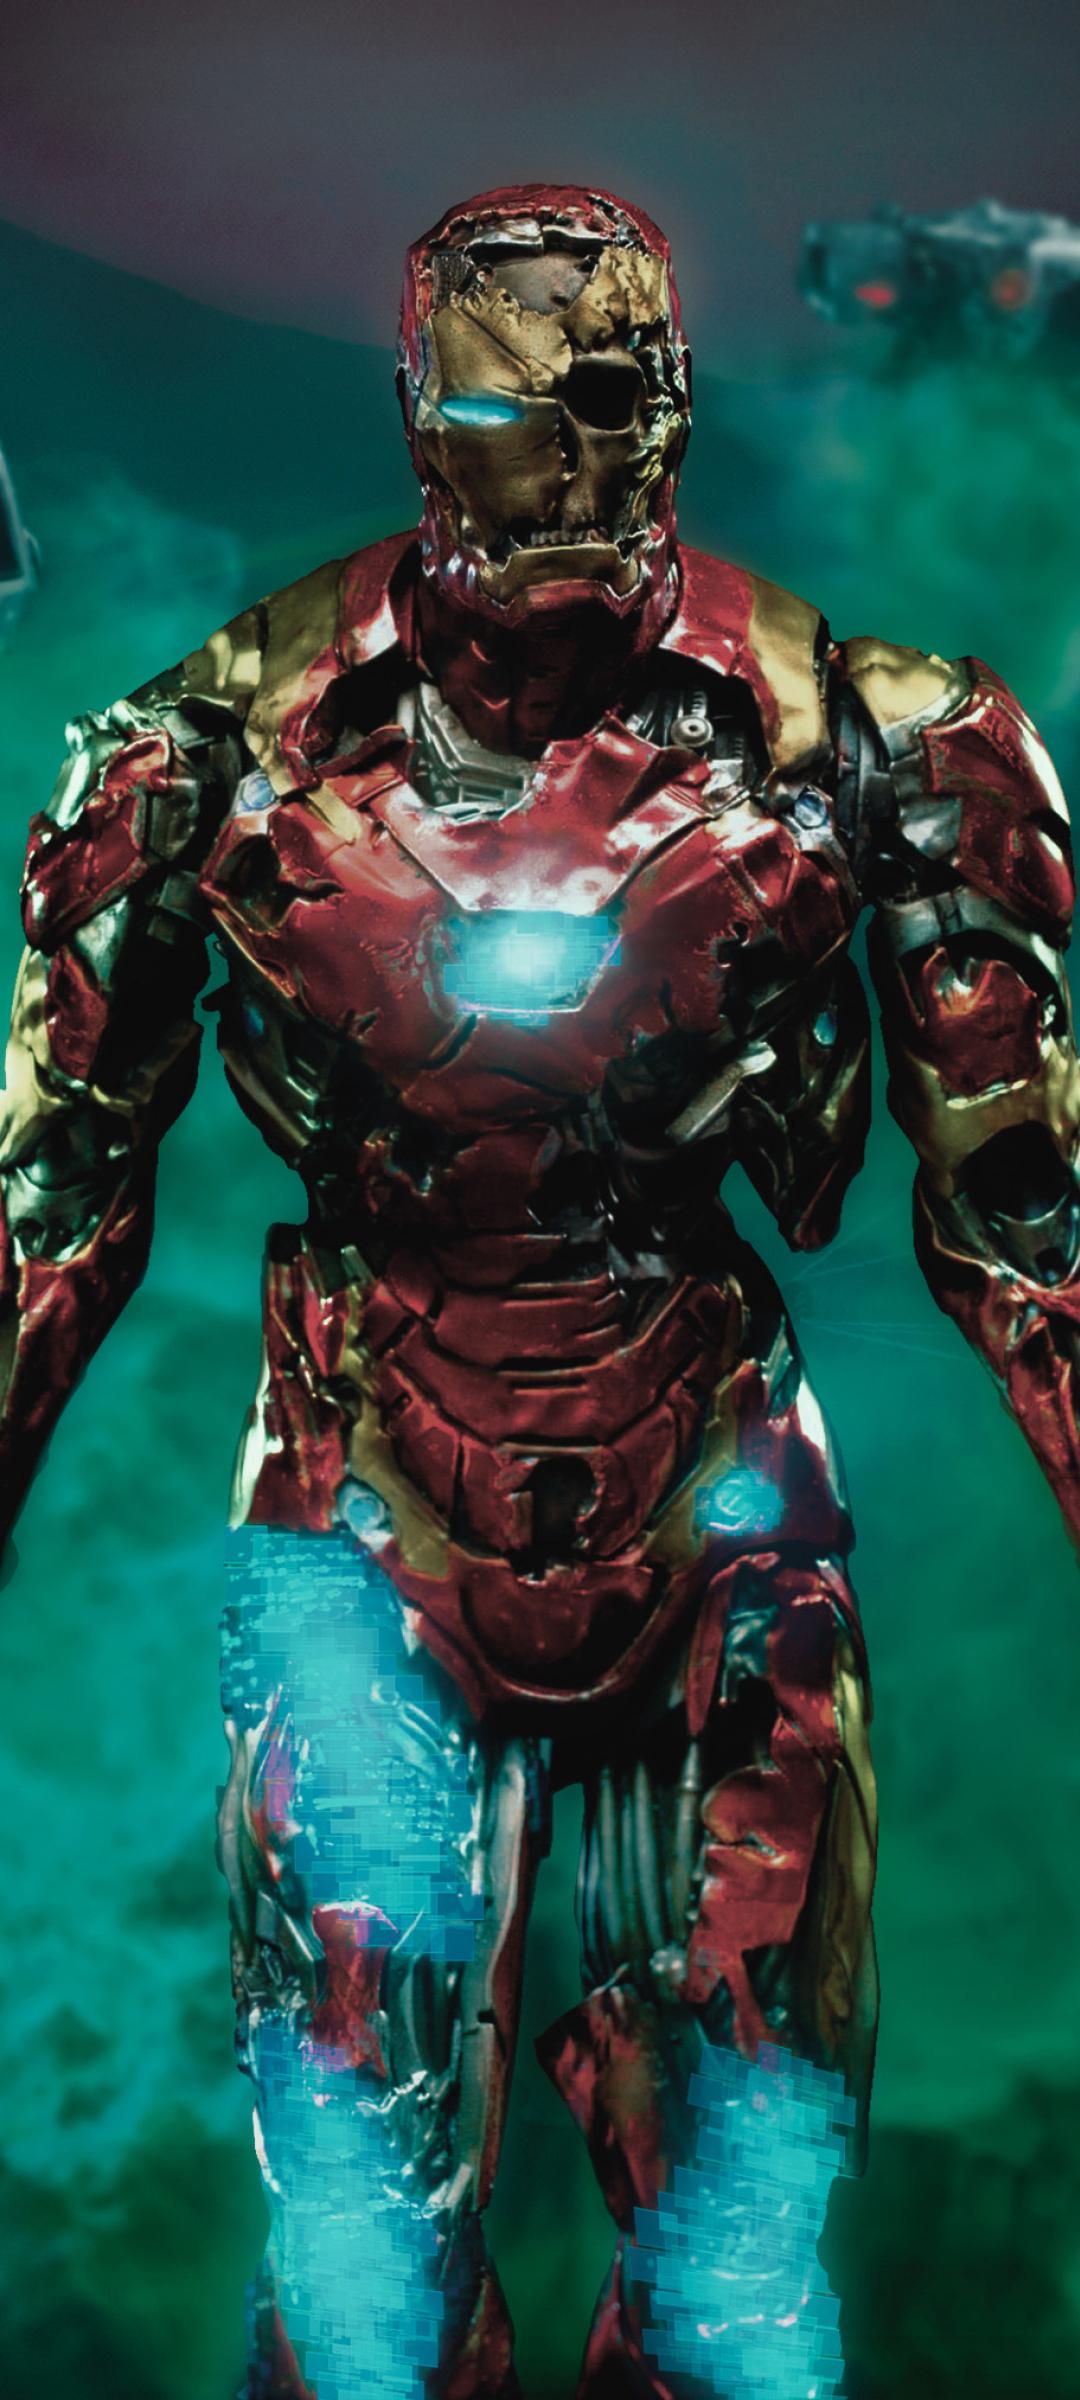 1080x2400 Iron Man Zombie 1080x2400 Resolution Wallpaper ...